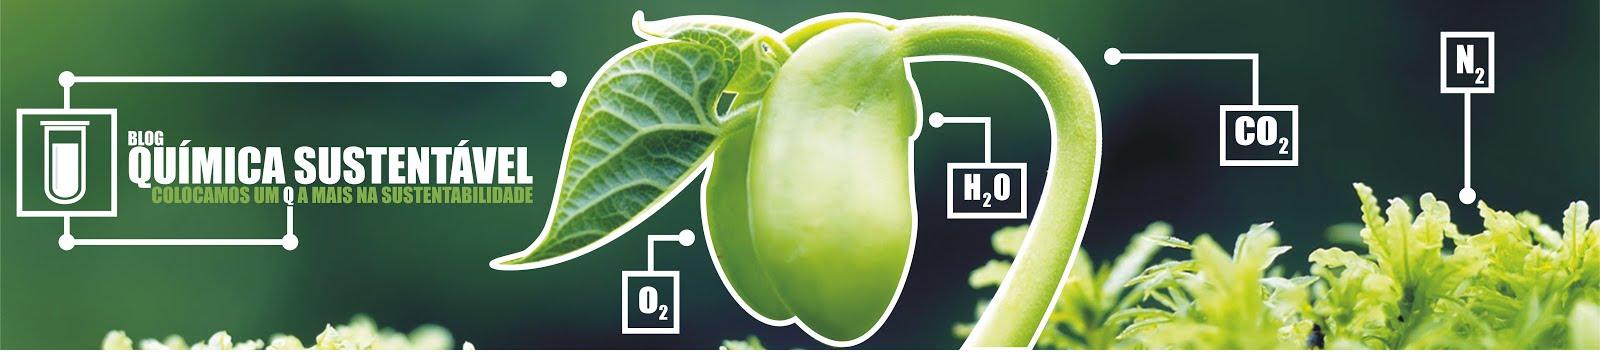 Química Sustentável